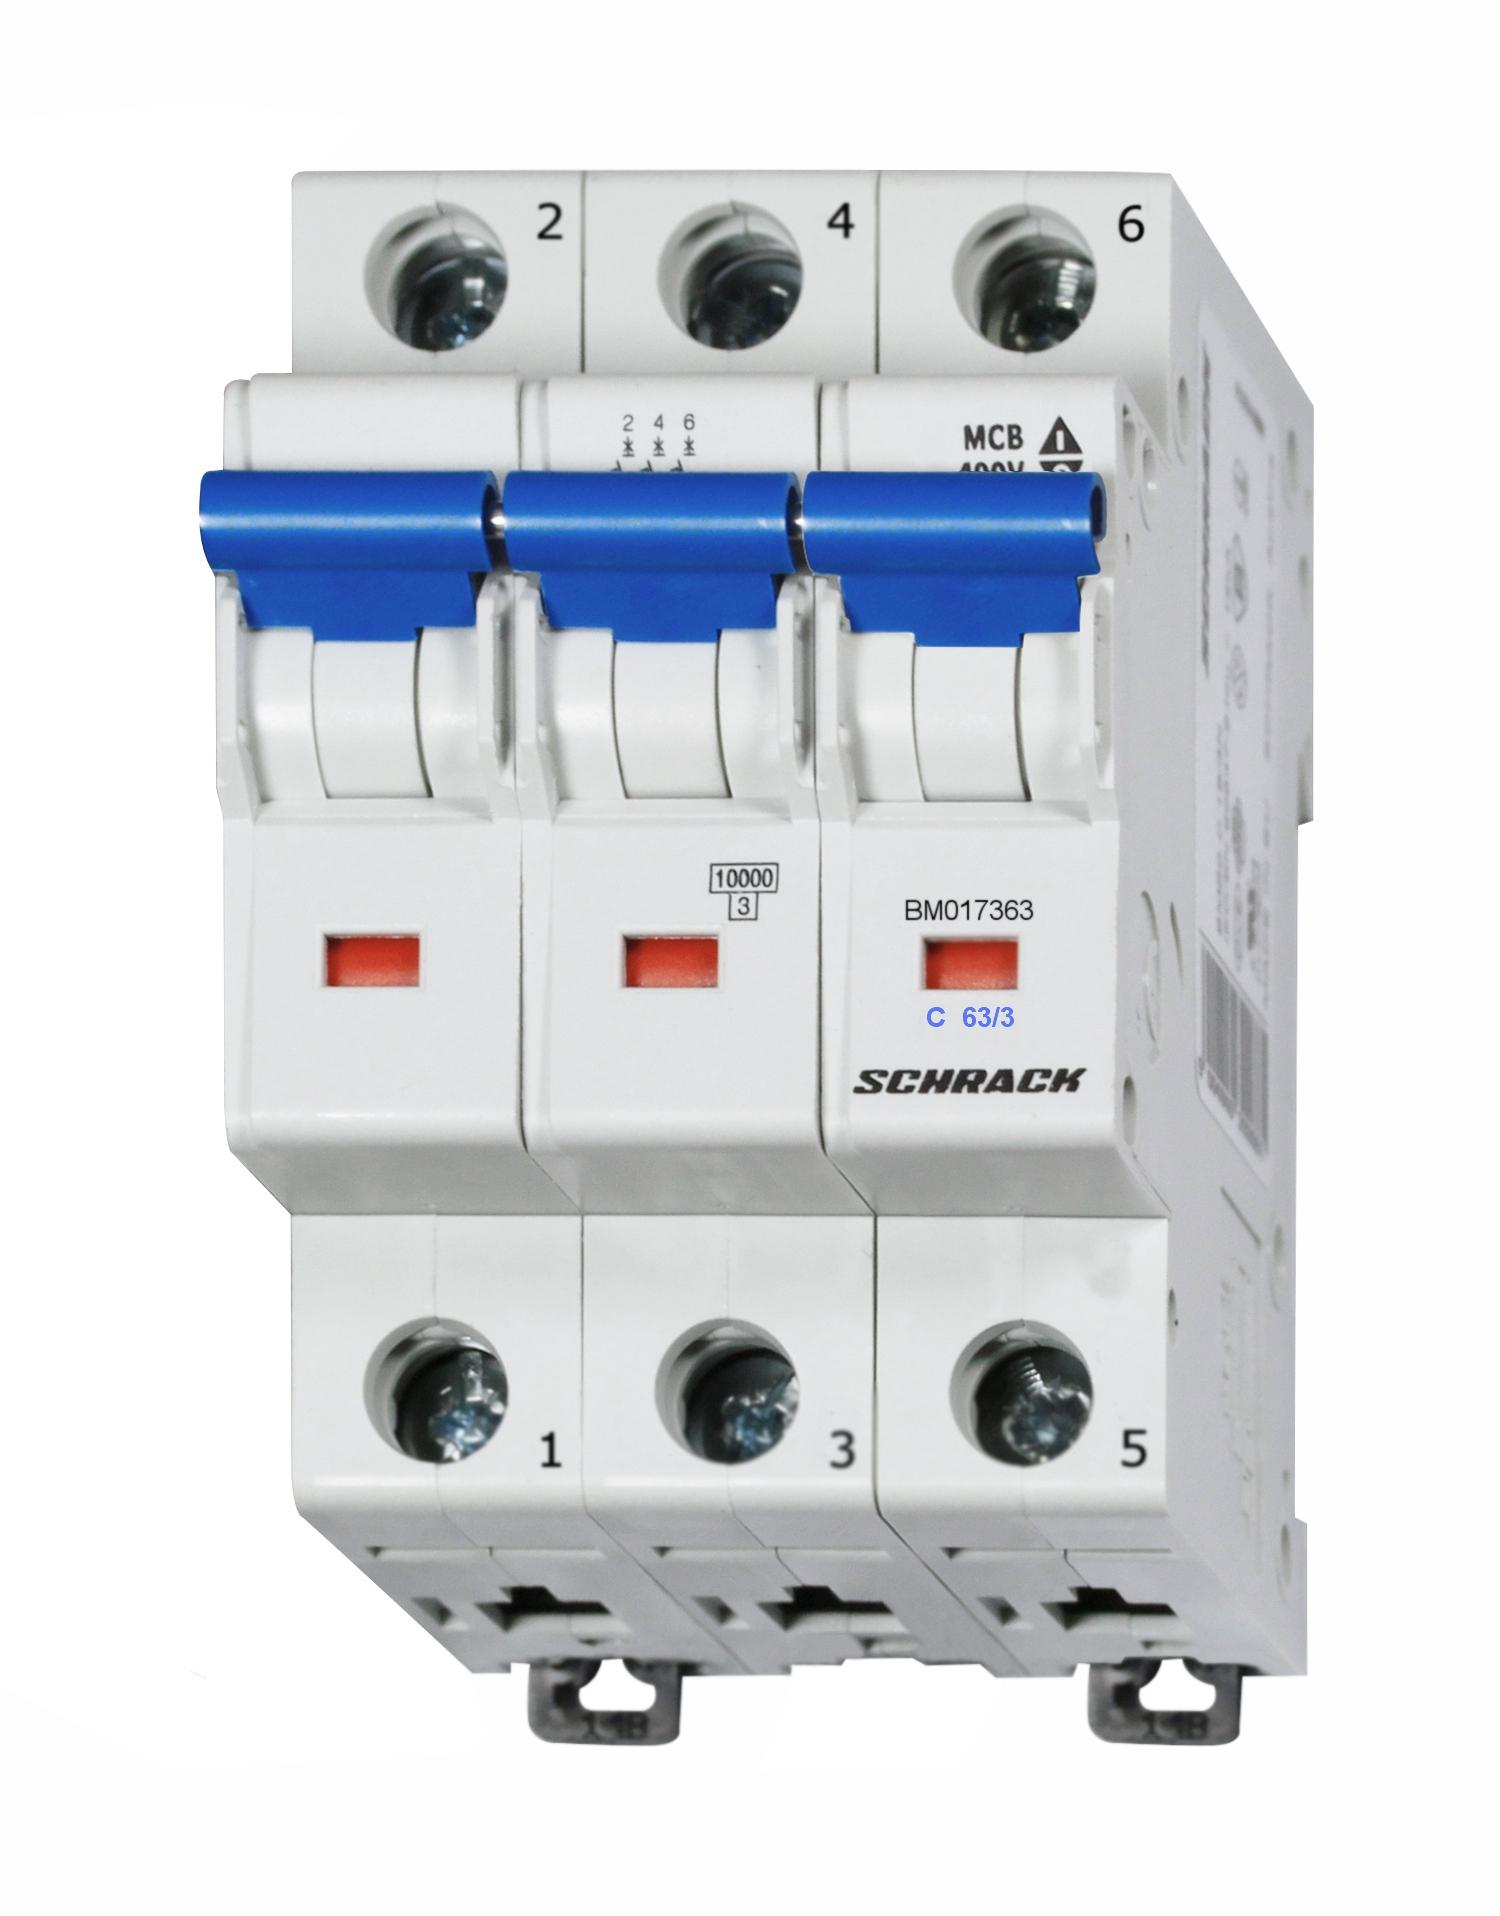 BM017363 - Schrack Technik